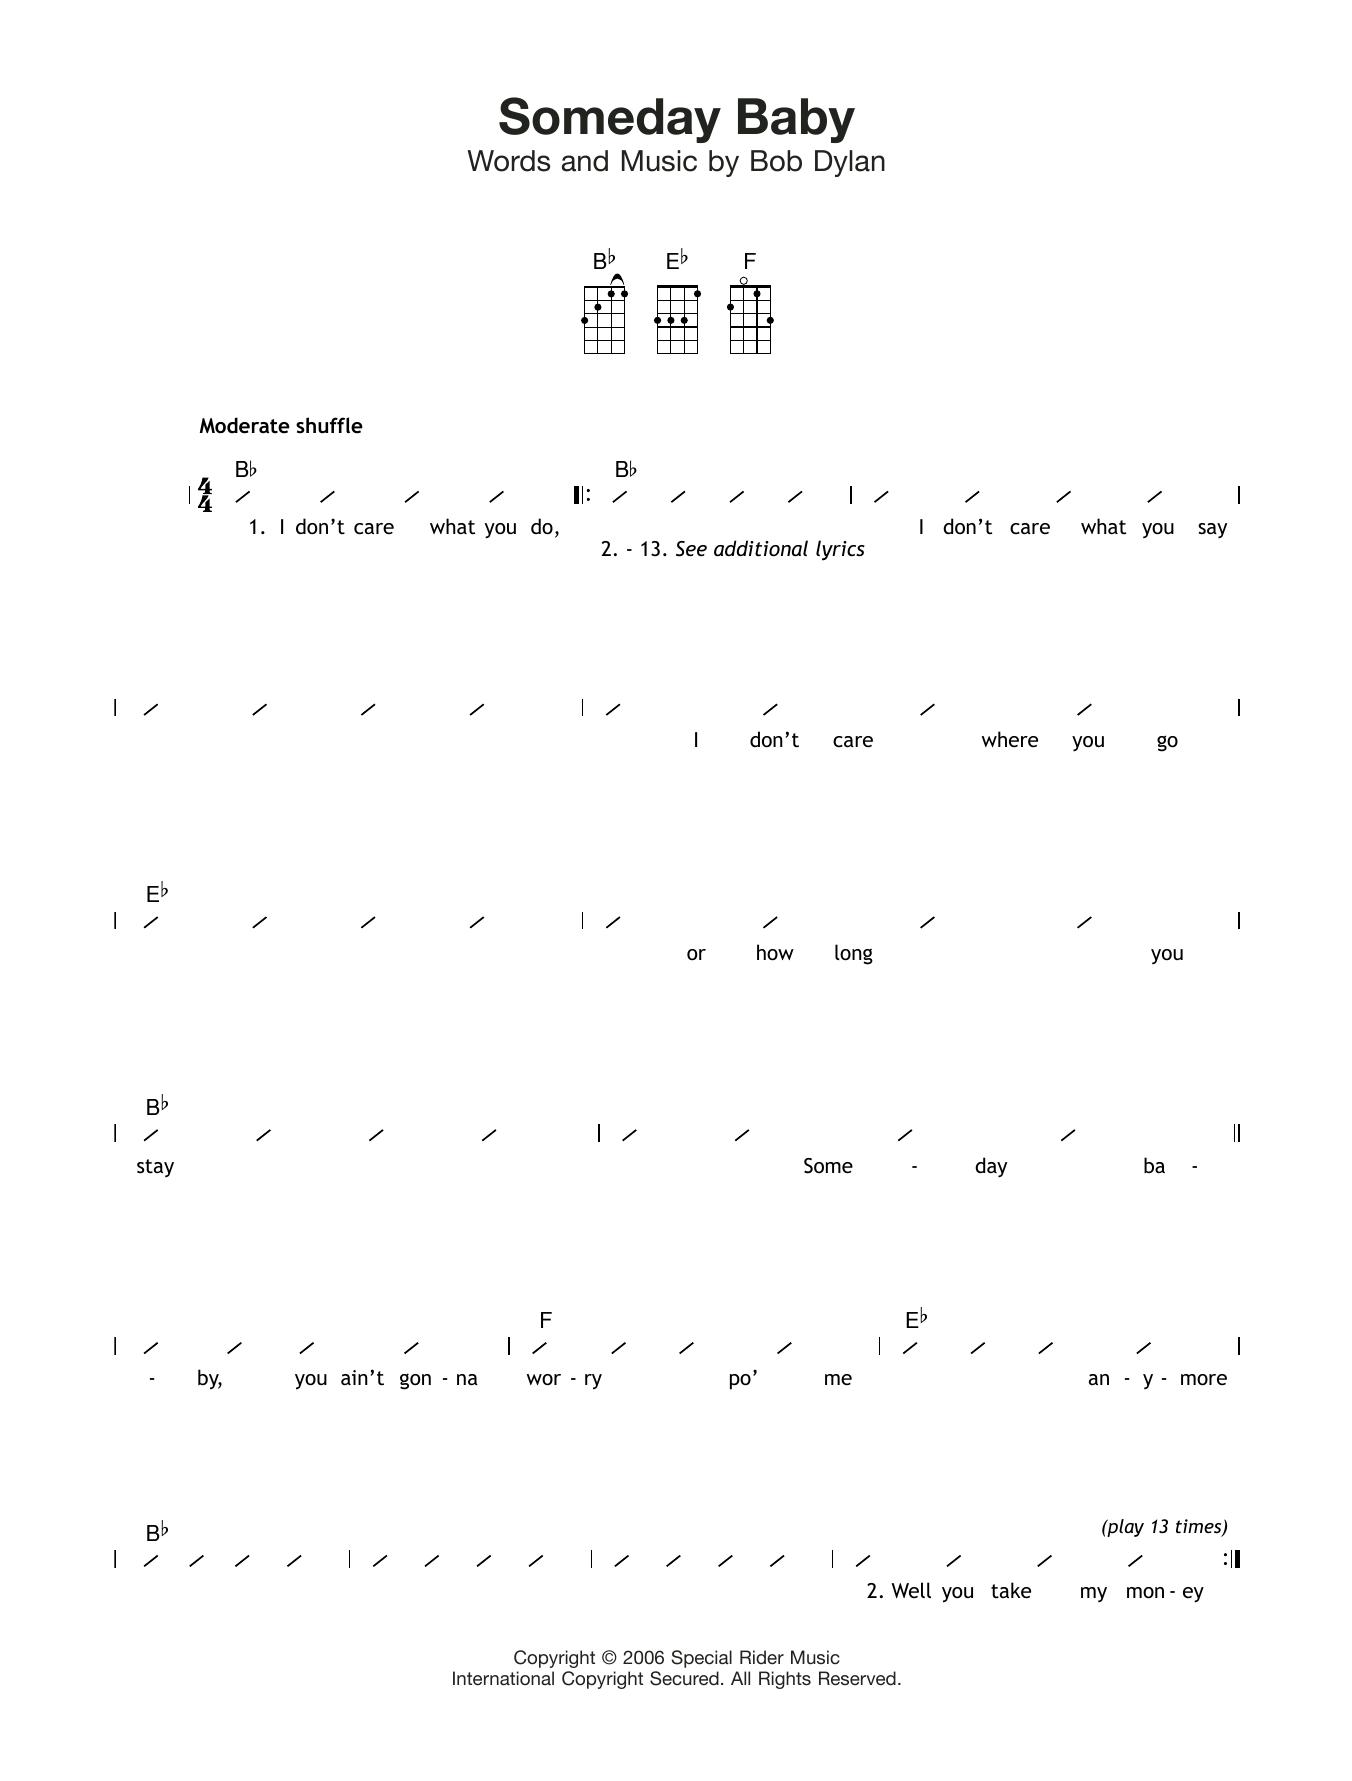 Someday Baby Sheet Music